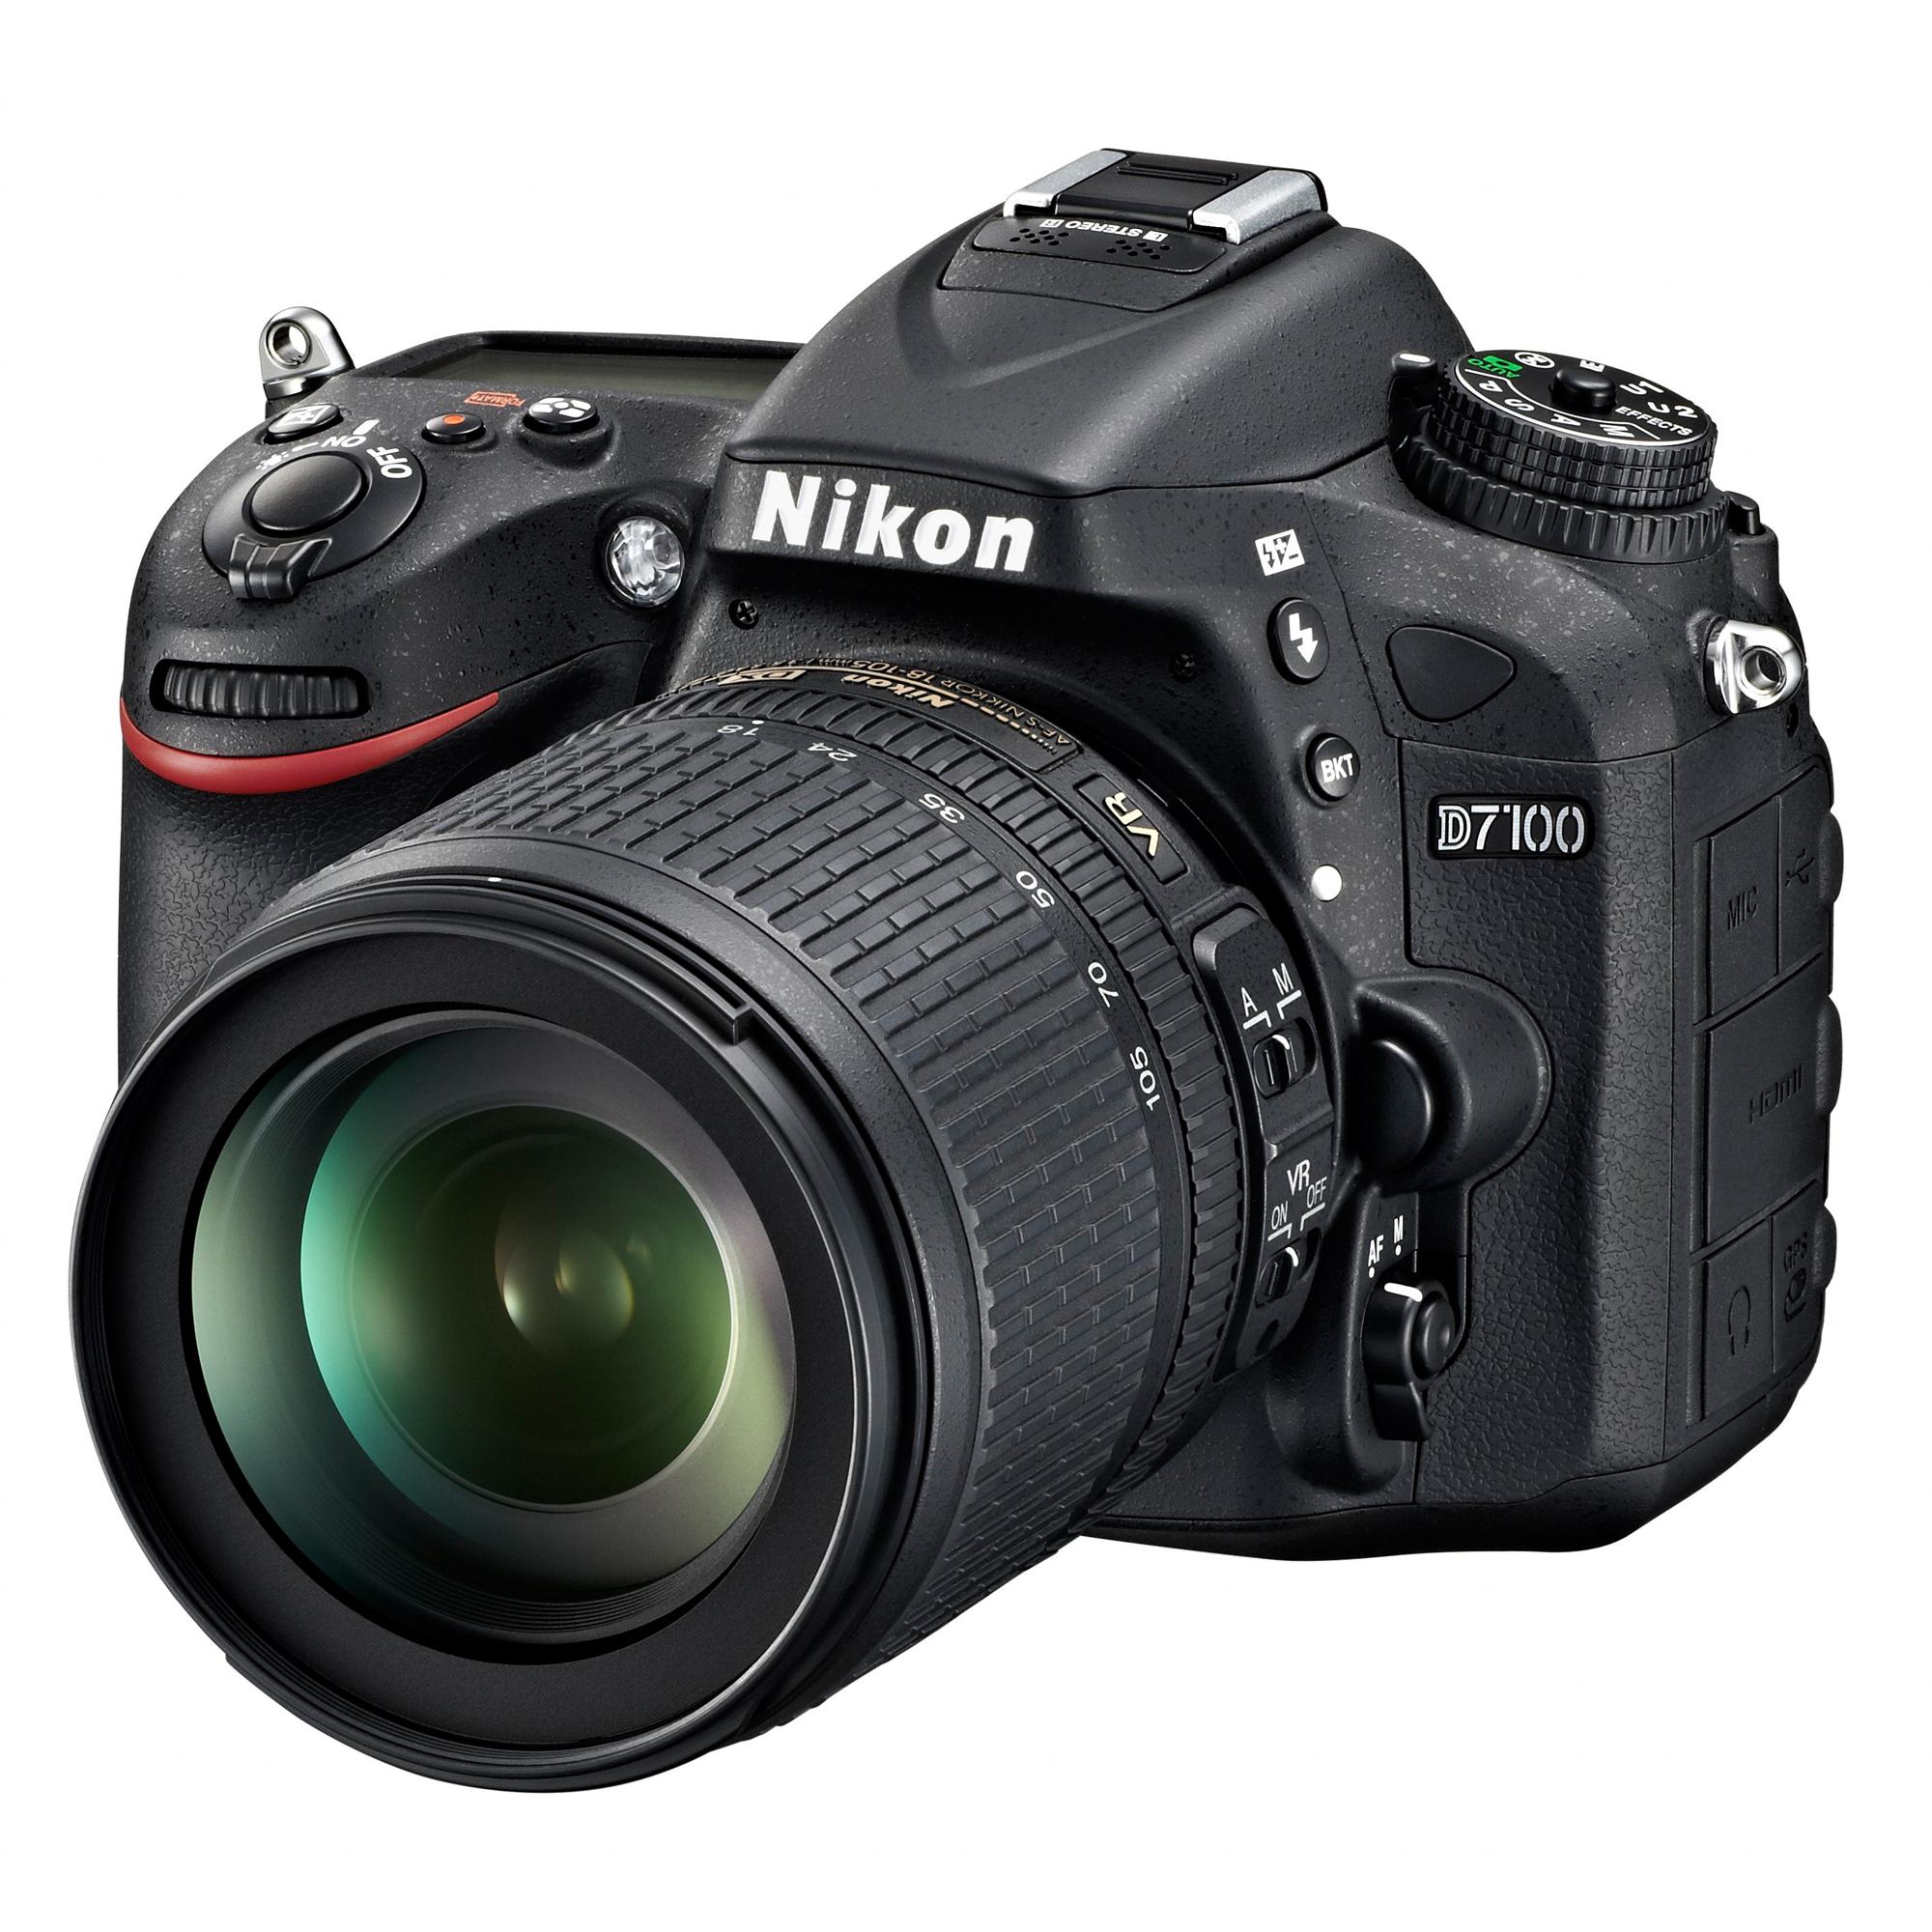 nikon camera slr digital lens vr cameras dslr d7100 7100 harrison 105mm